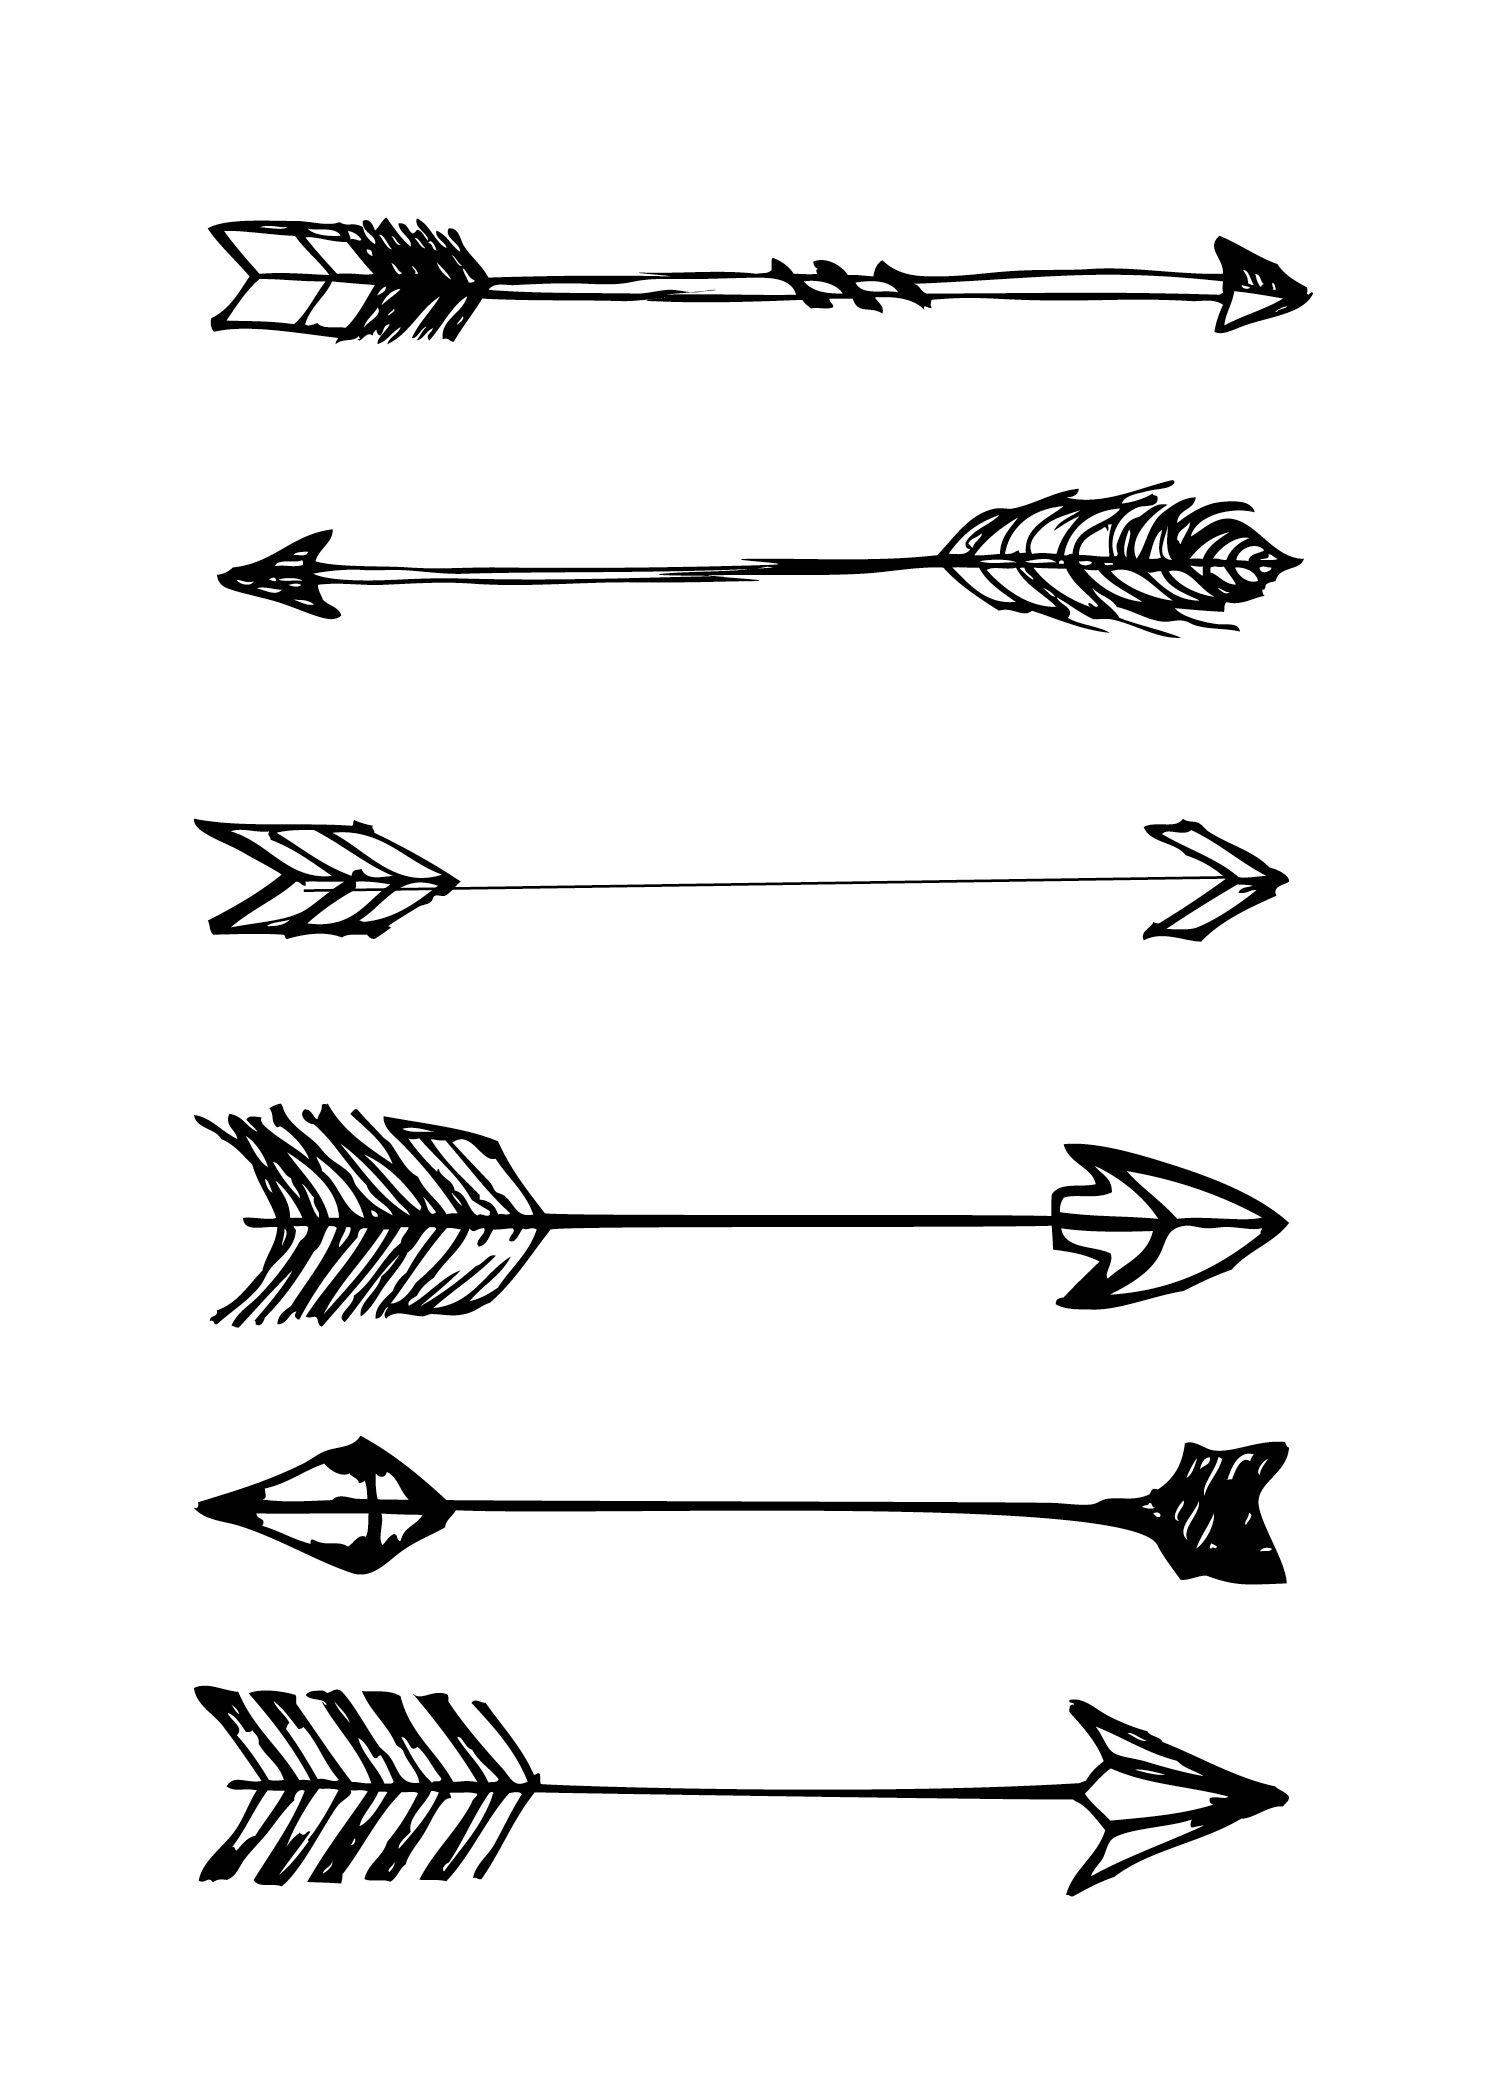 Free Printable | Zelf Maak Idee - Dibujos, Flechas En Png - Free Black And White Printables